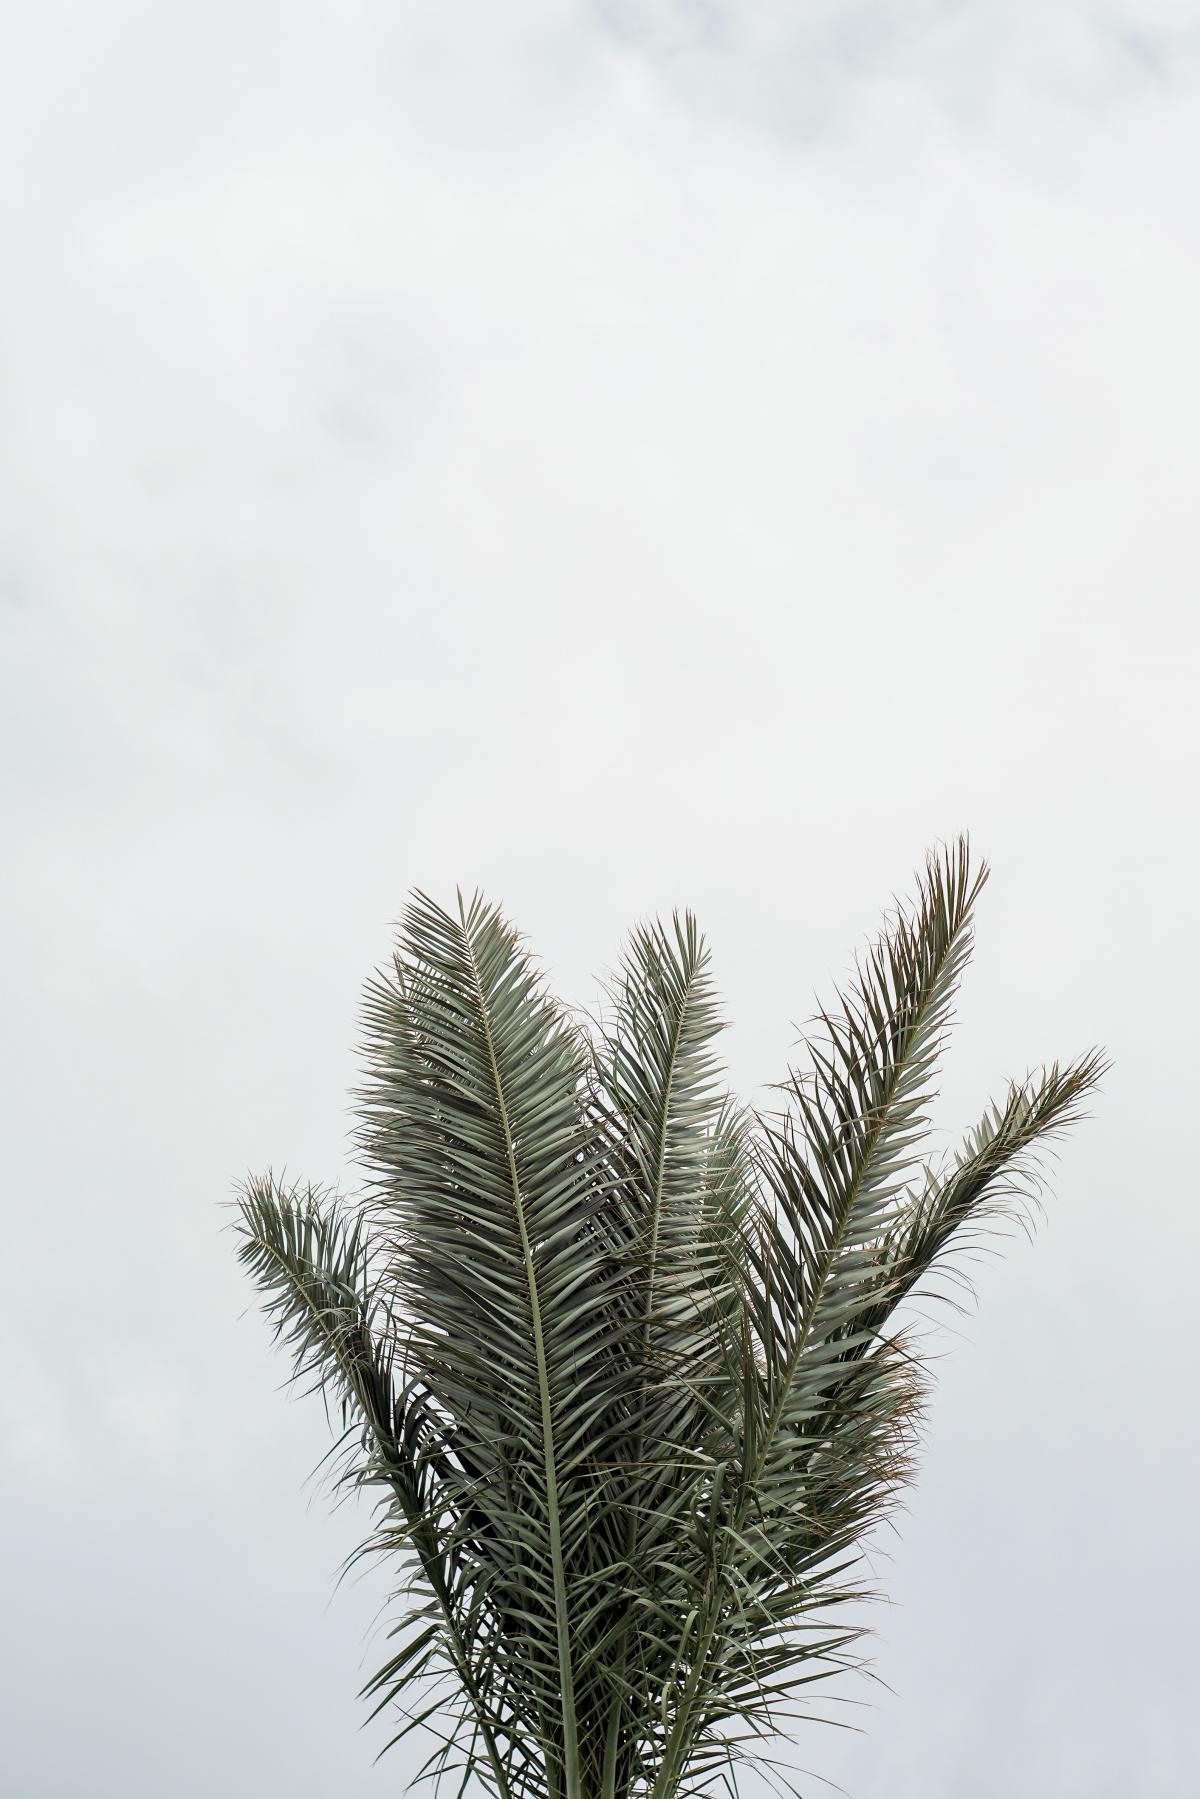 Wheat Plant Fir #419794